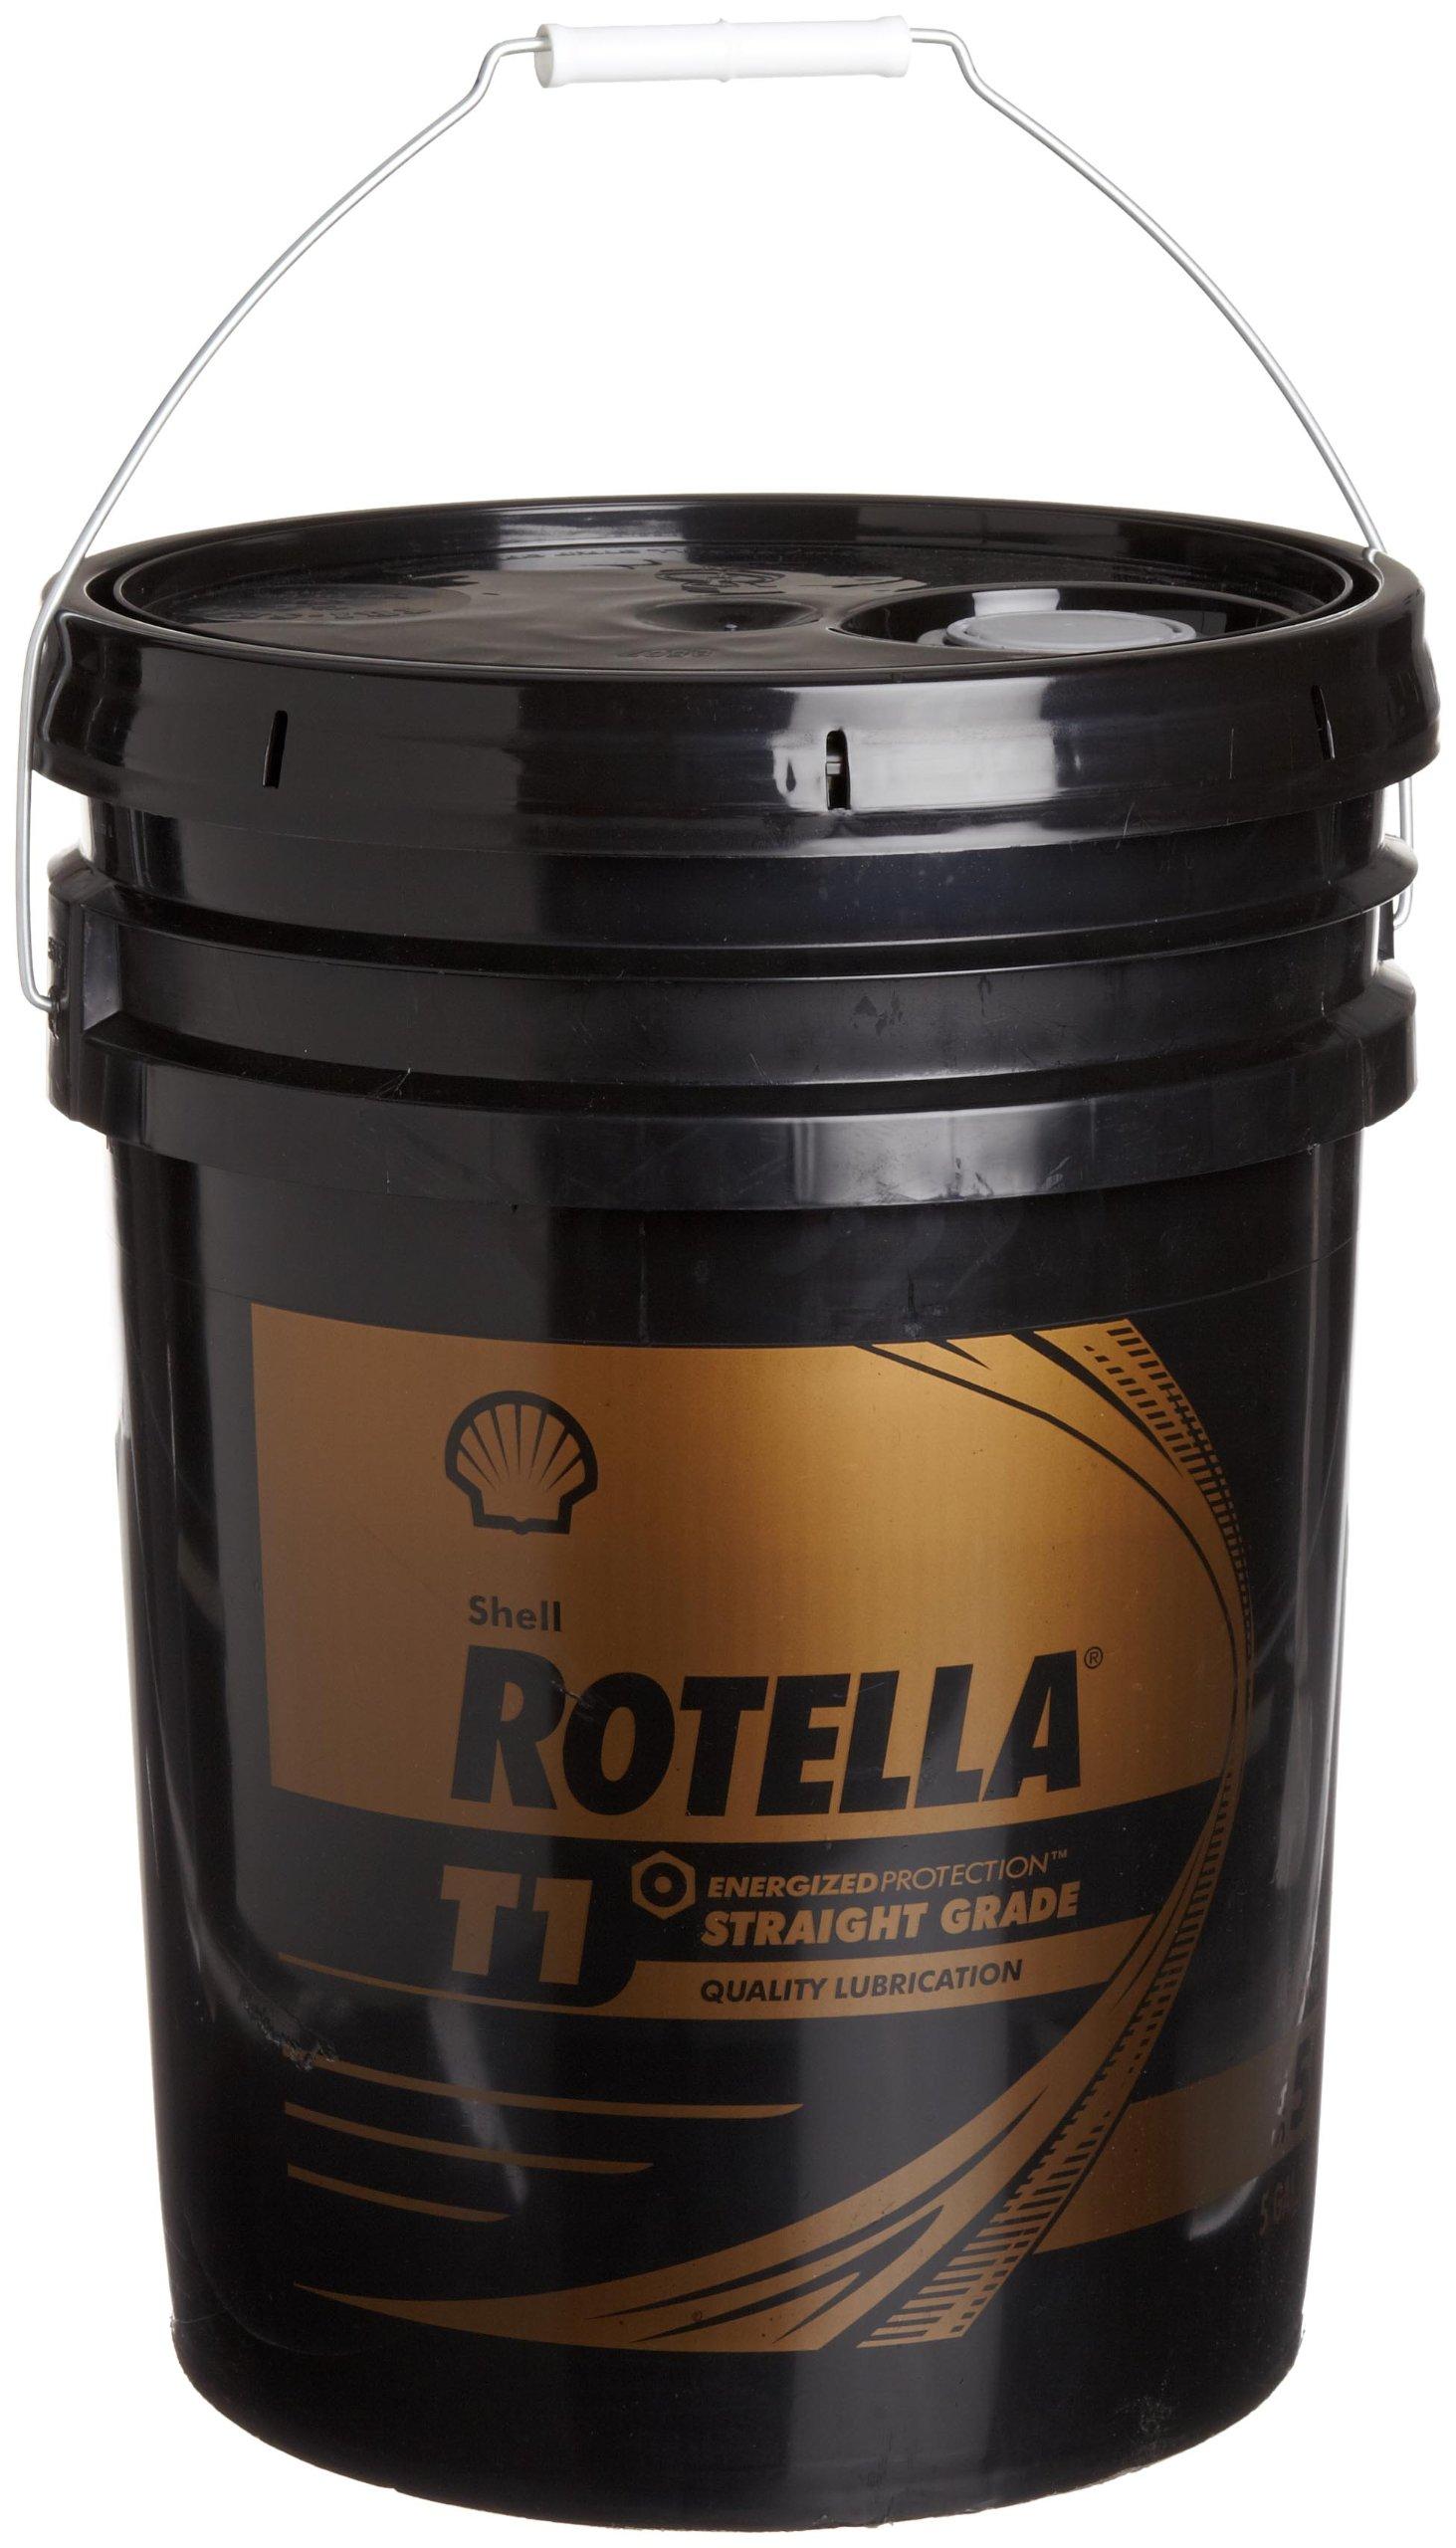 Shell ROTELLA 550019893 T1 50 Heavy Duty Engine Diesel Oil - 5 Gallon Pail